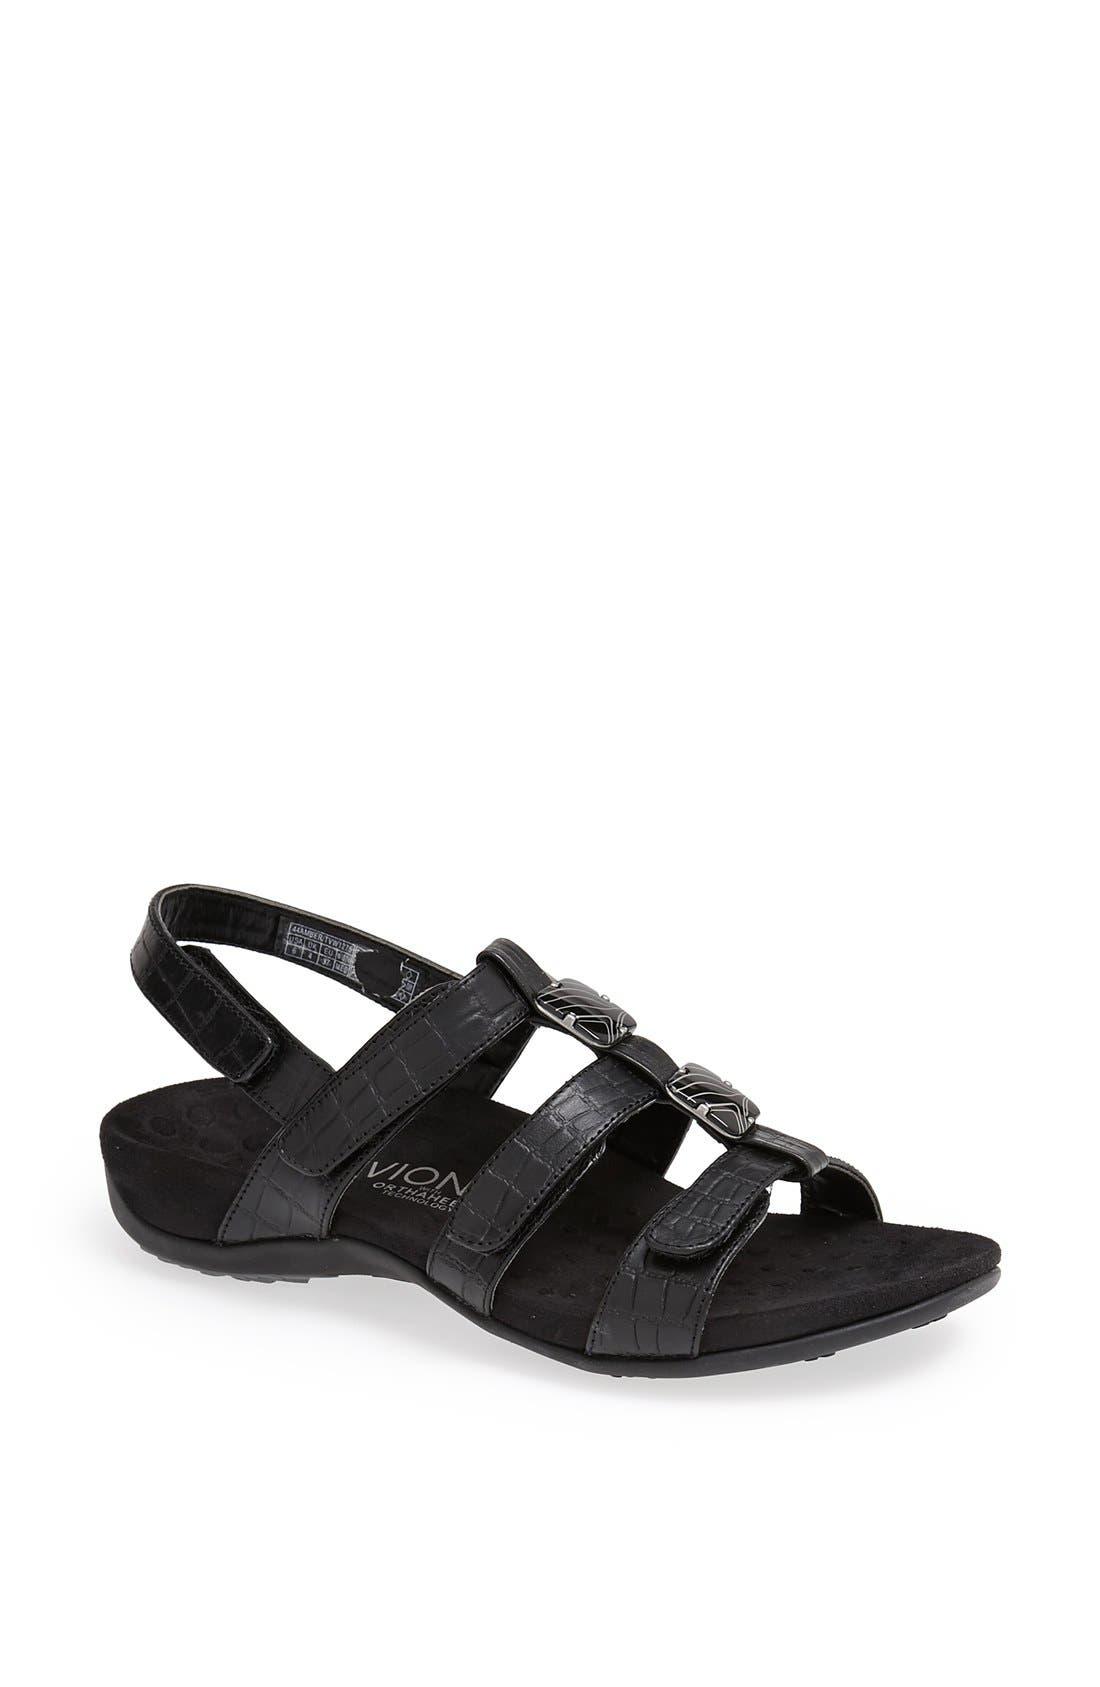 Alternate Image 1 Selected - Vionic with Orthaheel® 'Amber' Adjustable Sandal